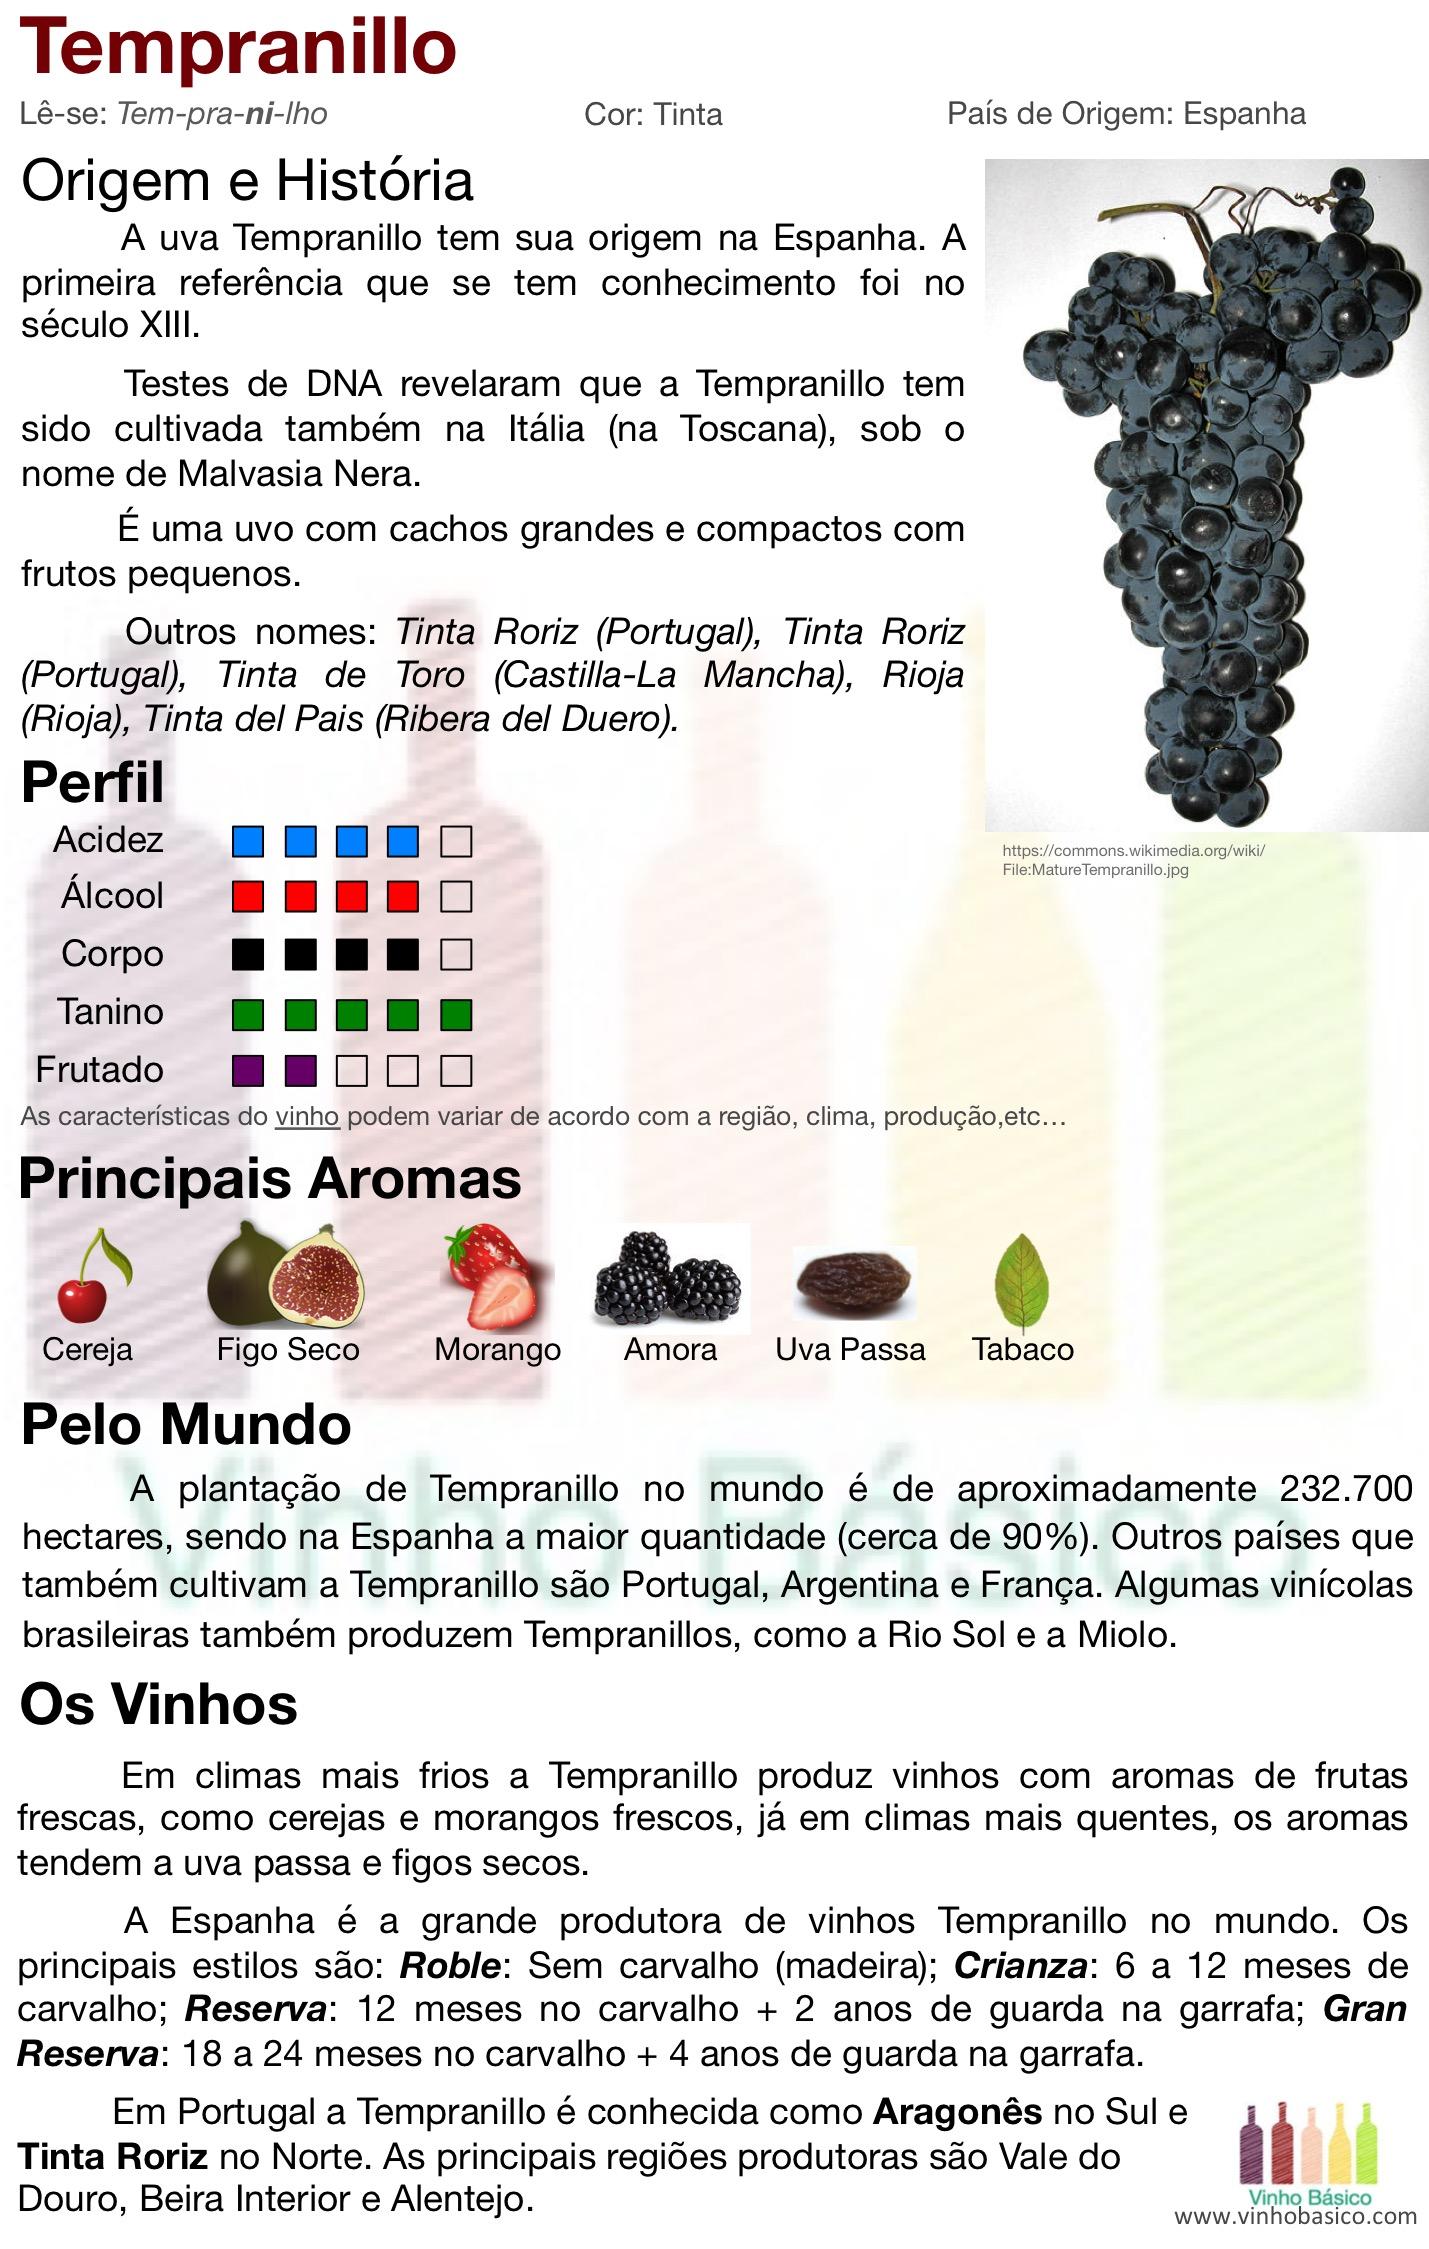 Tempranillho vinhobasico